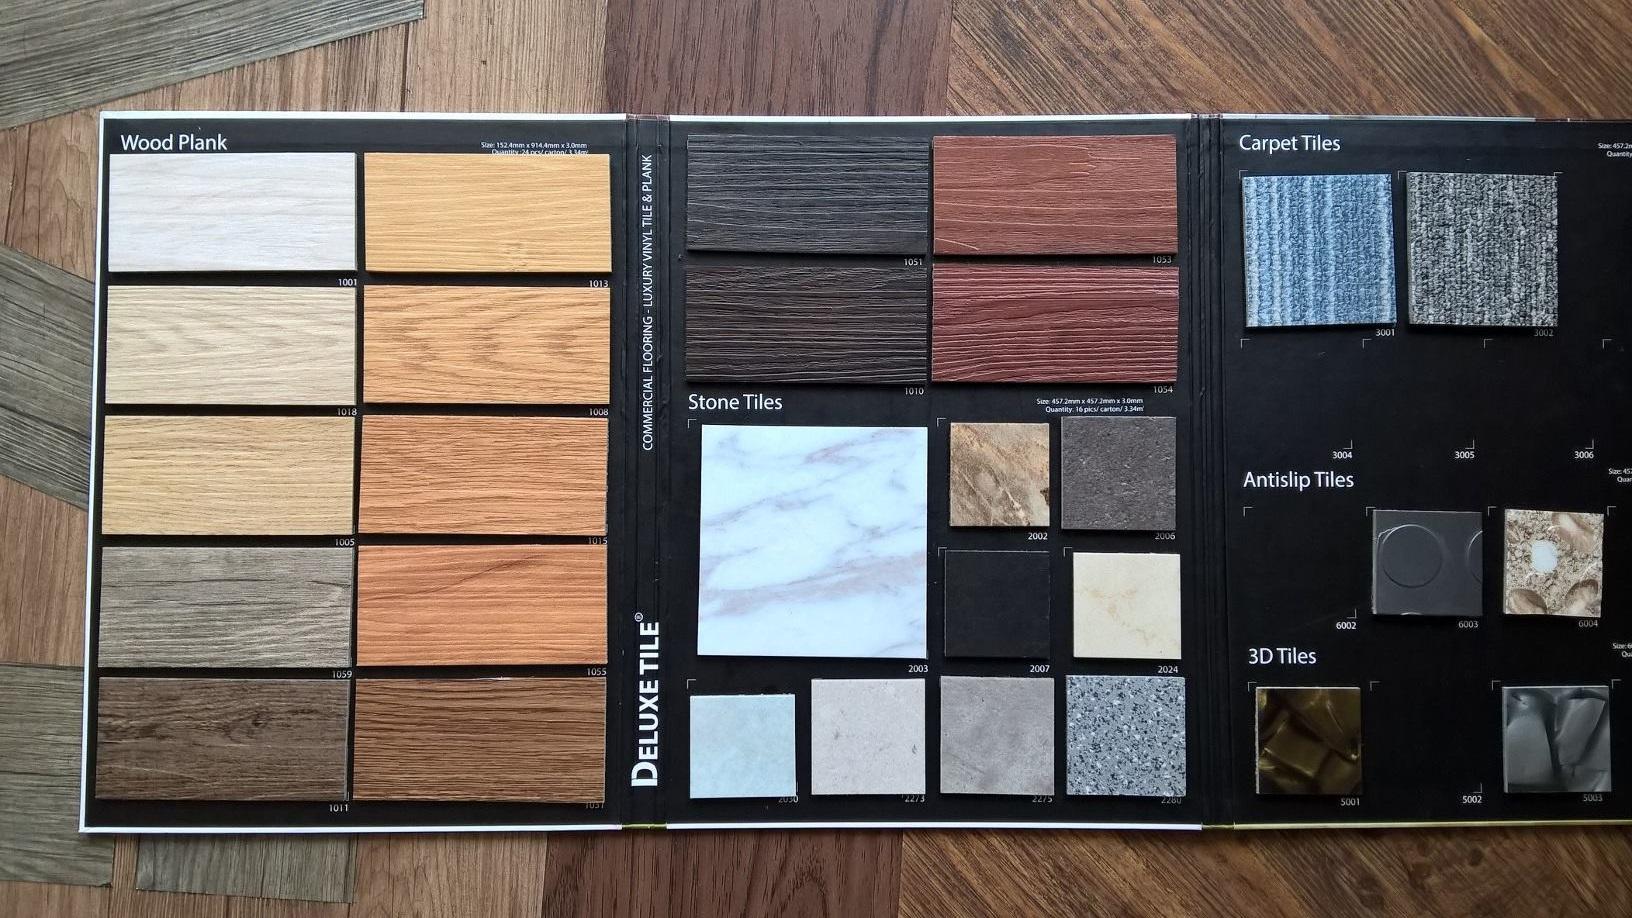 sàn nhựa giả gỗ deluxe 1001